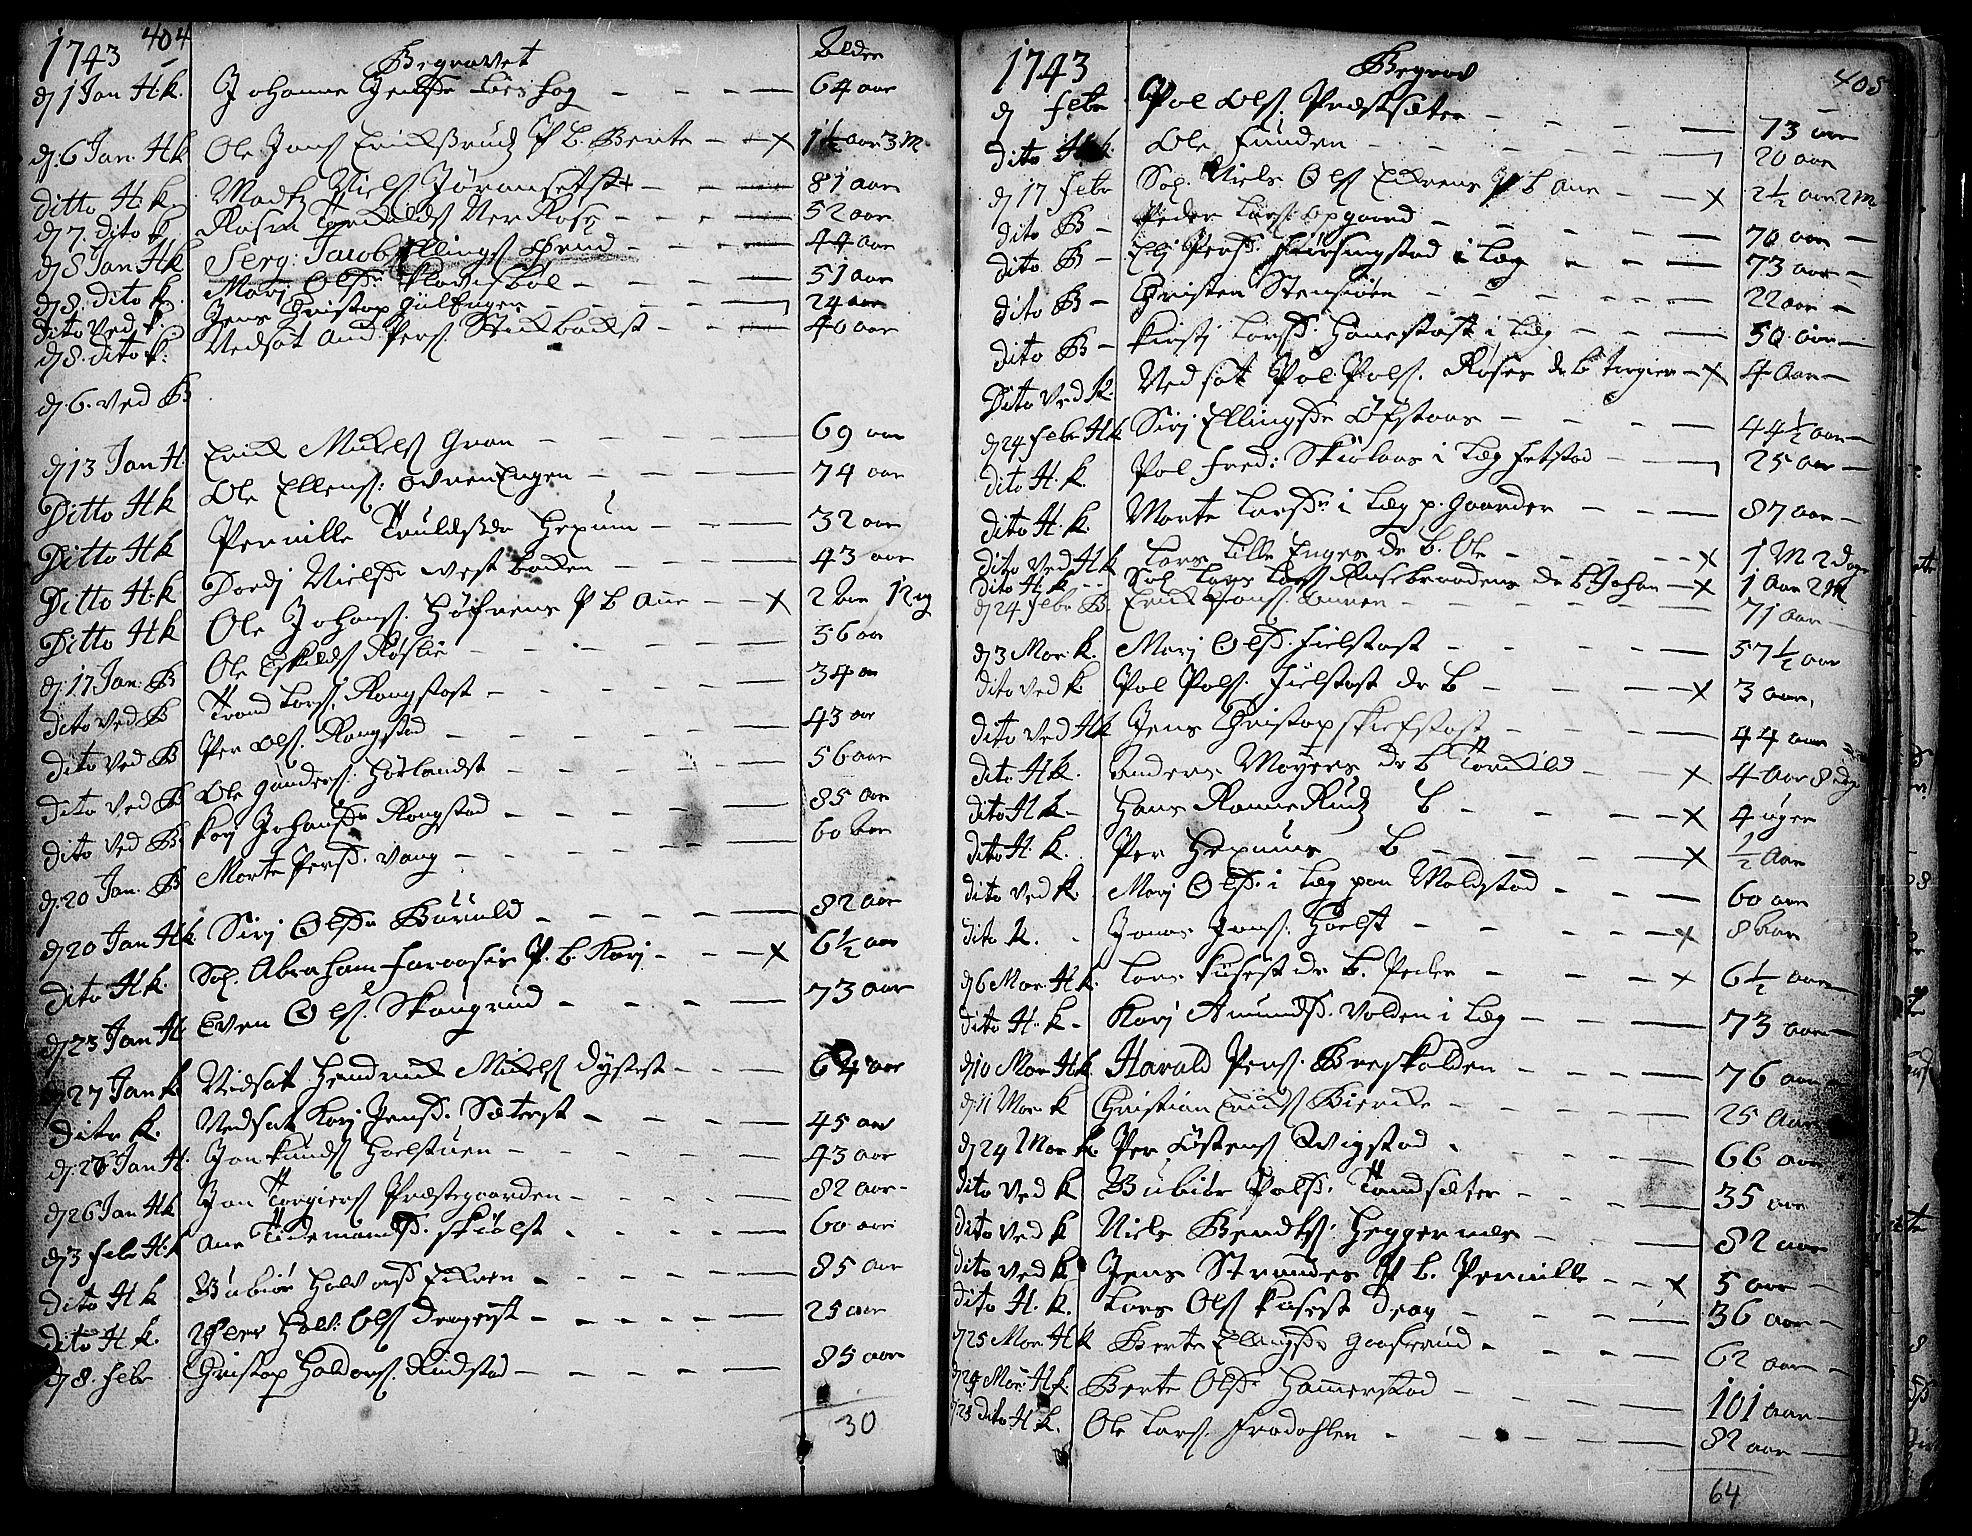 SAH, Toten prestekontor, Ministerialbok nr. 3, 1734-1751, s. 404-405